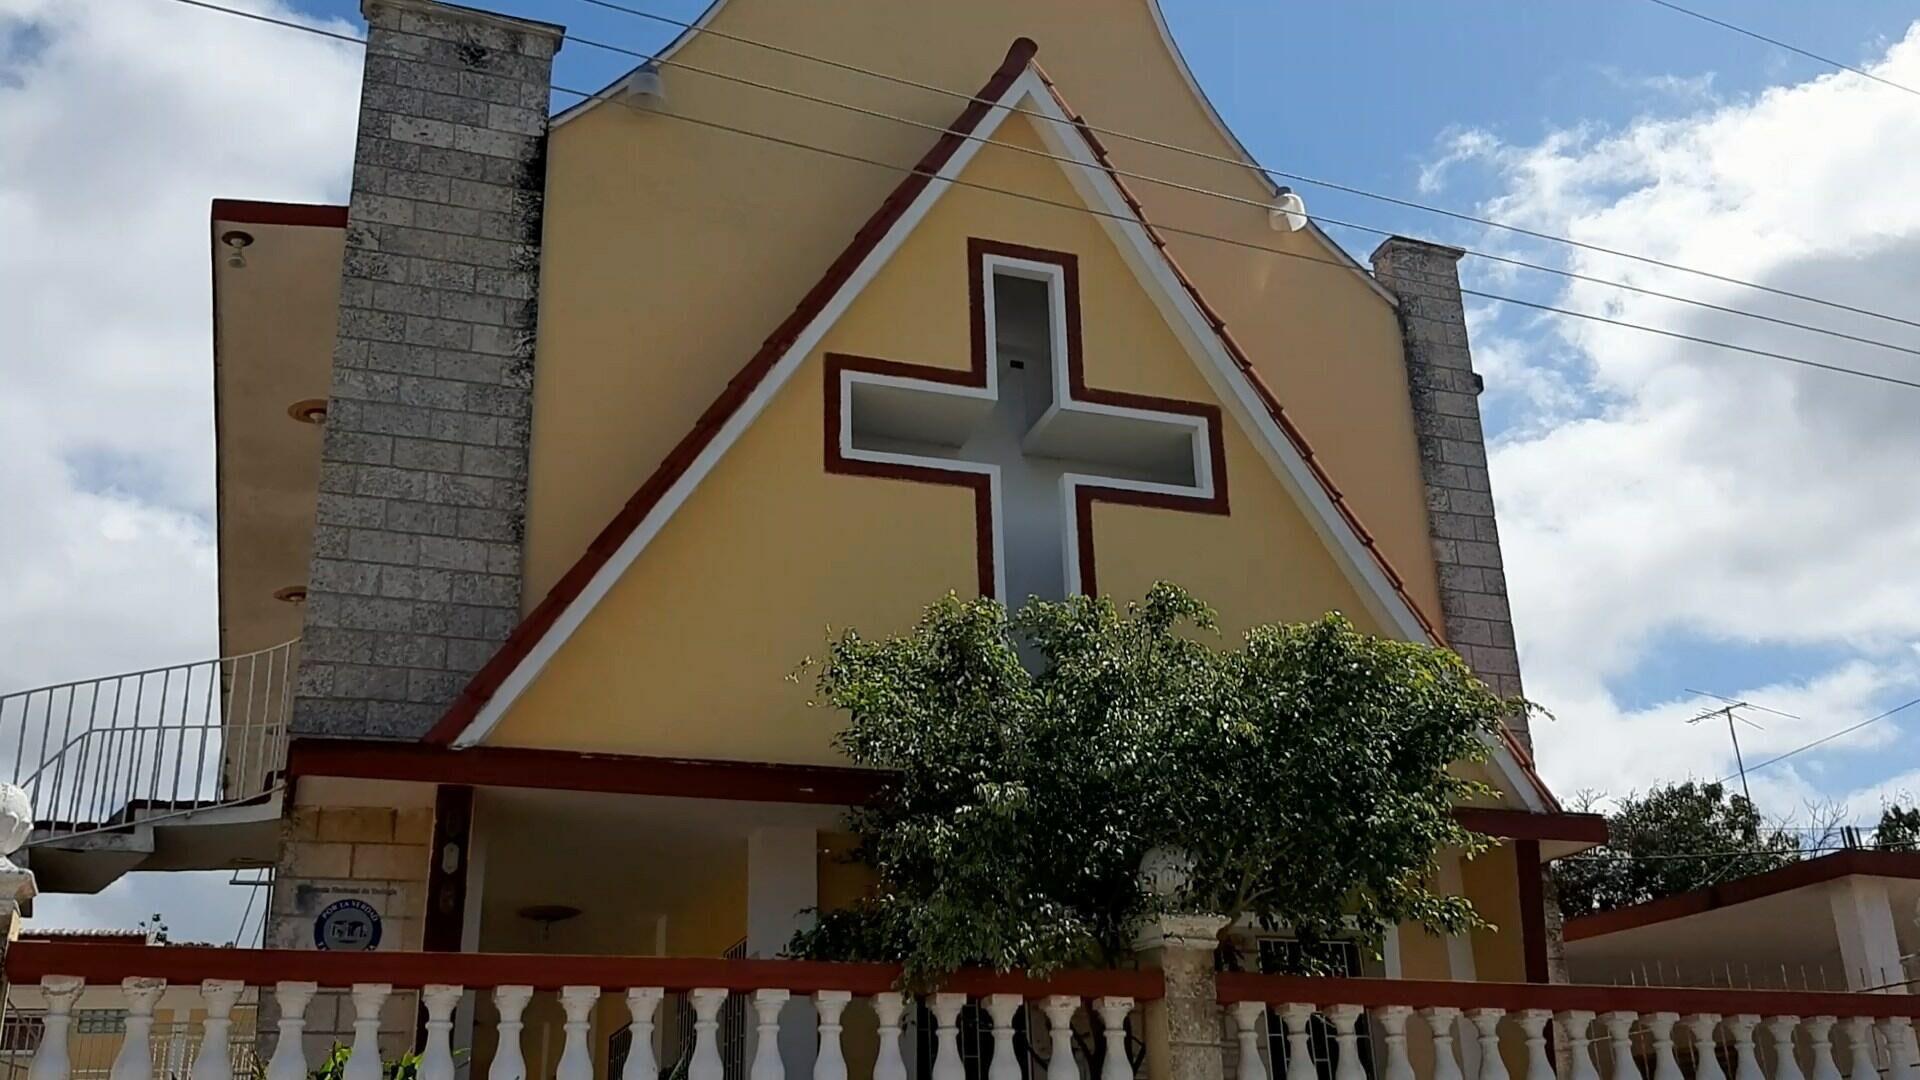 Iglesia Bando de Gedeón, Cuba  - Sputnik Mundo, 1920, 22.02.2021